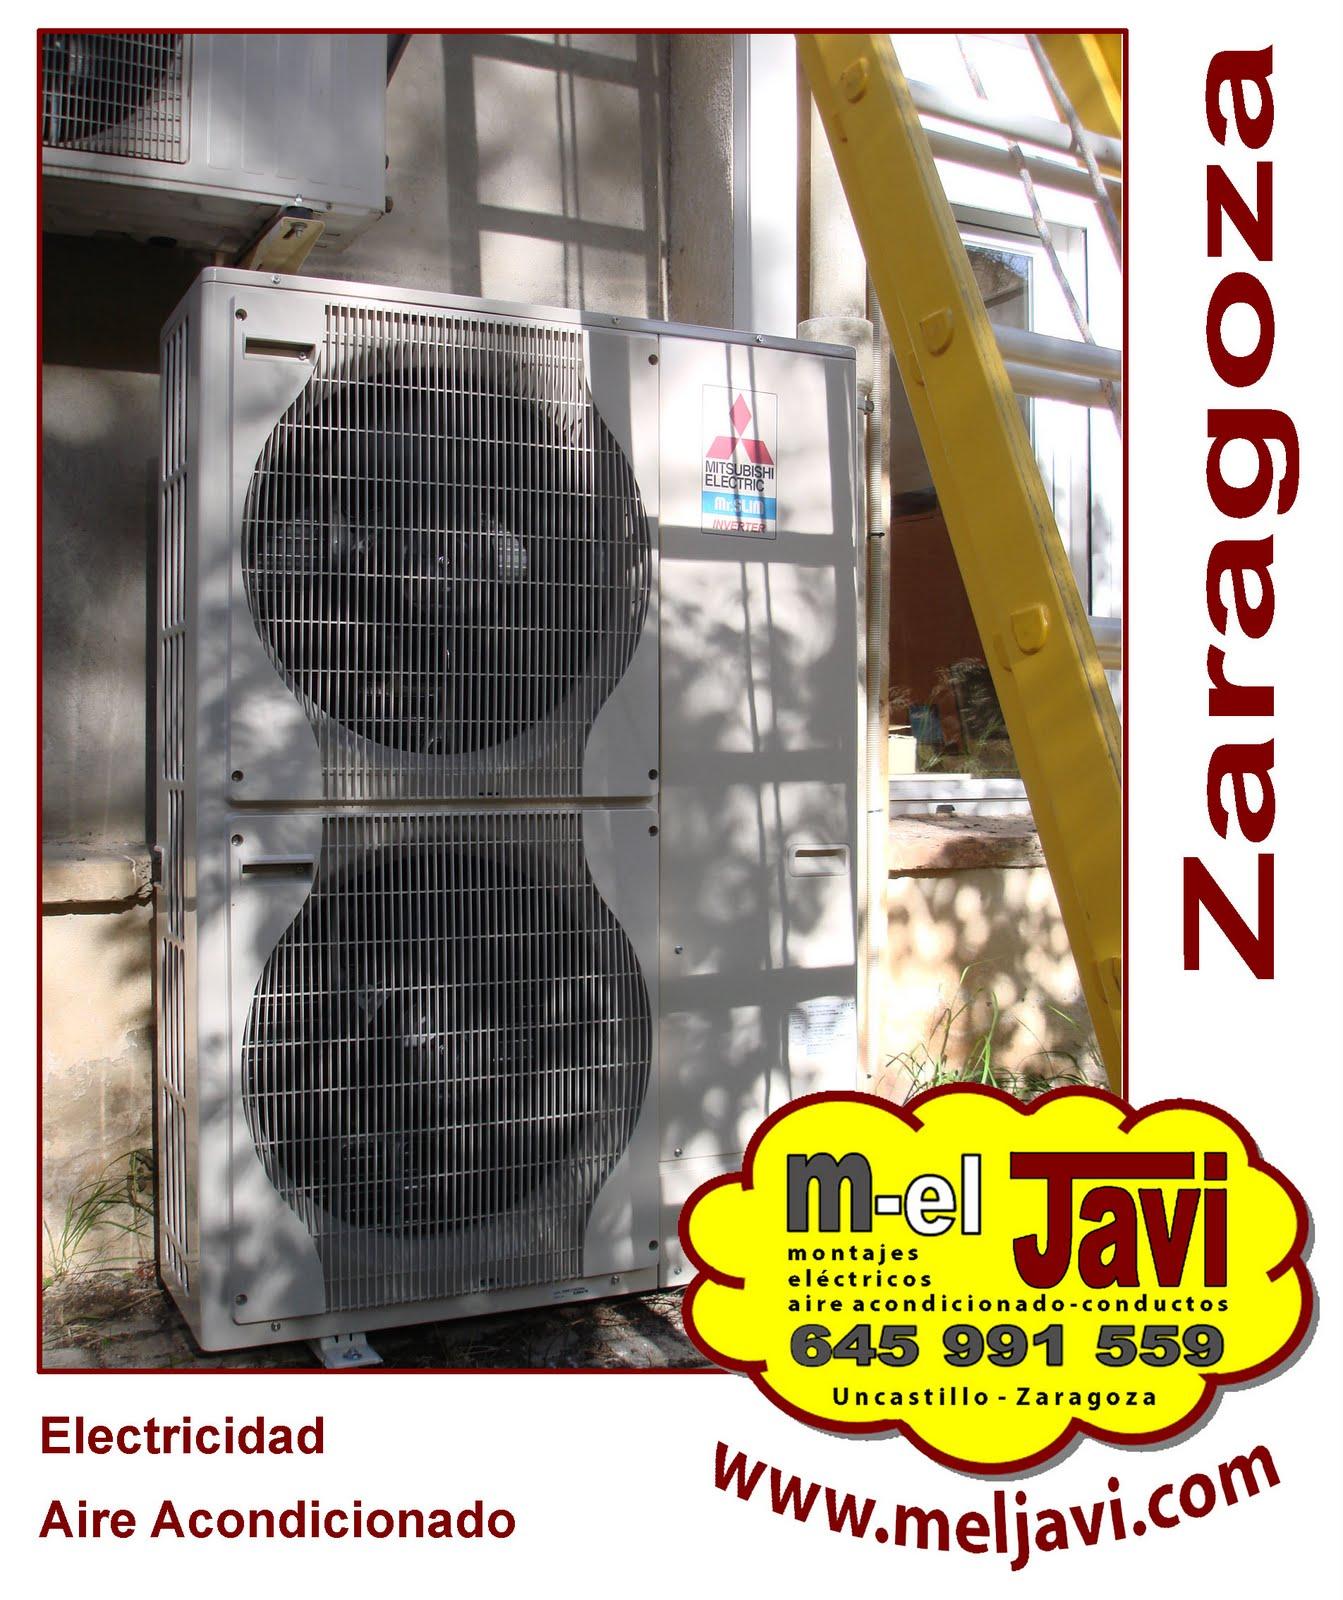 Meljavi electricistas zaragoza uncastillo for Instaladores aire acondicionado zaragoza